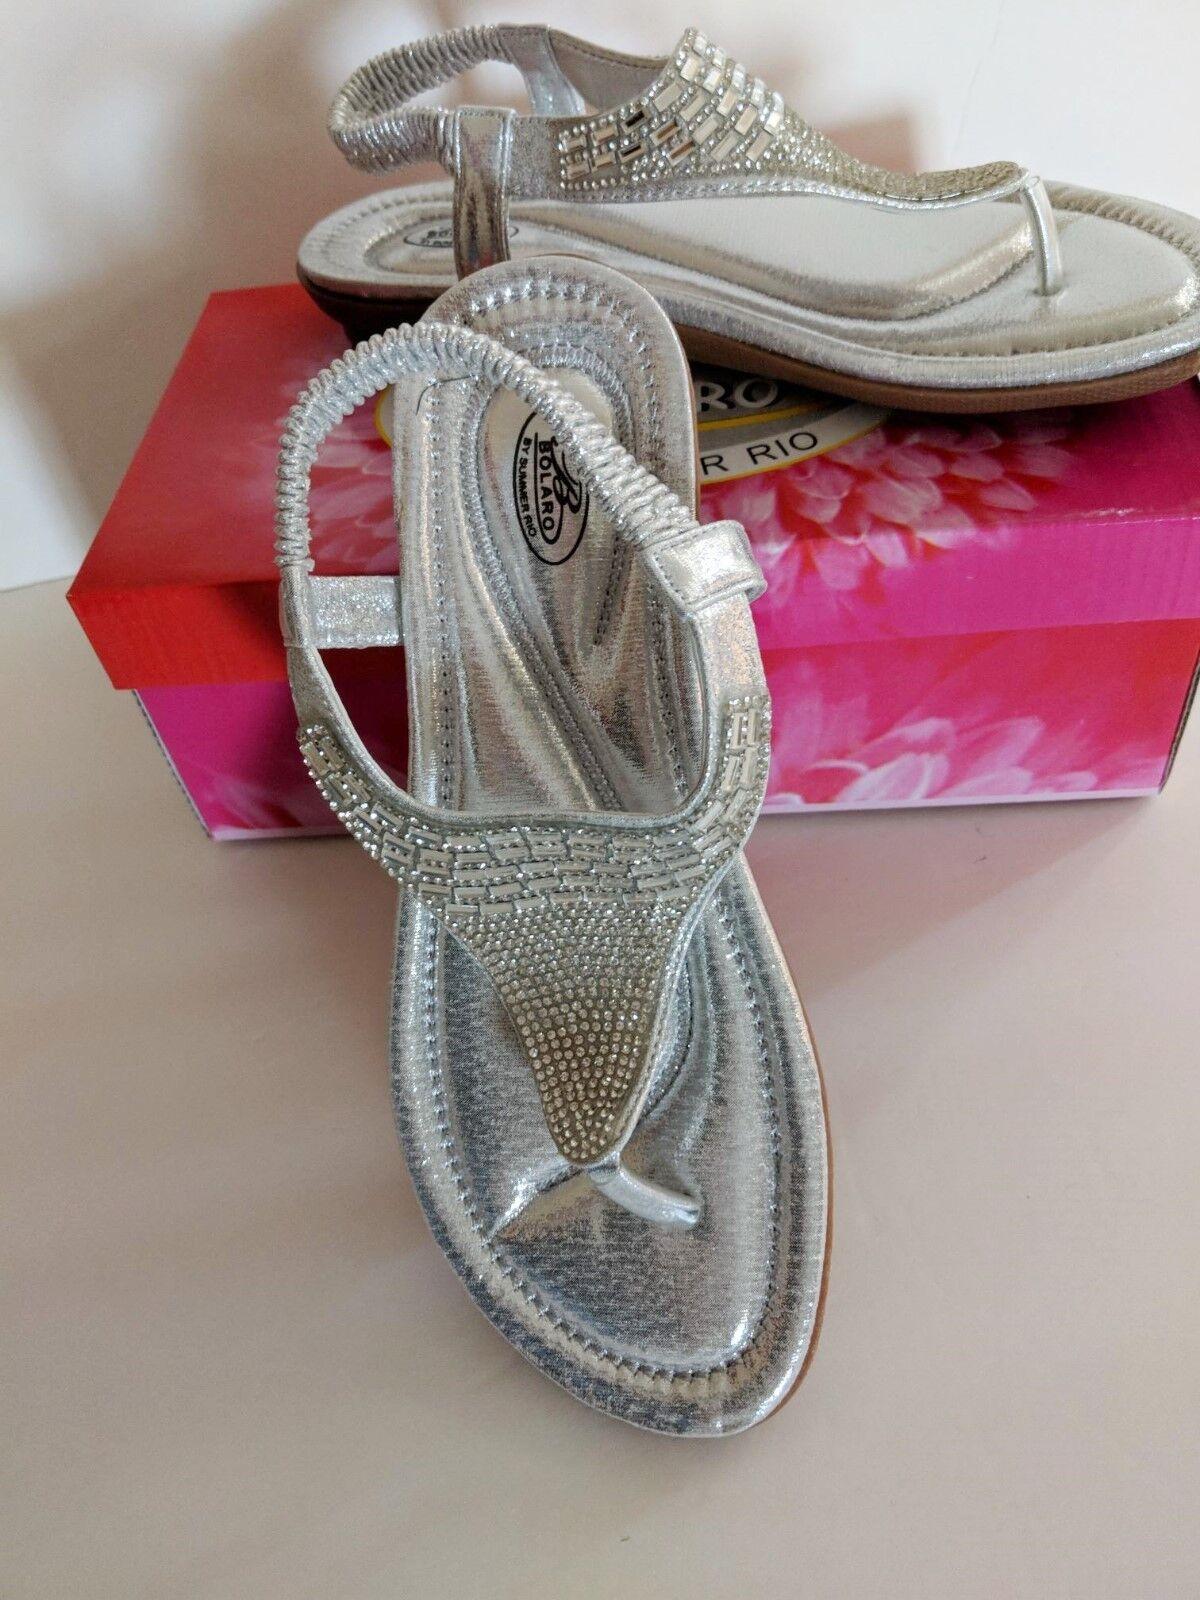 Bolaro By Summer Rio Chrome Rhinestone Sandals Thong Flip Flop DF7911